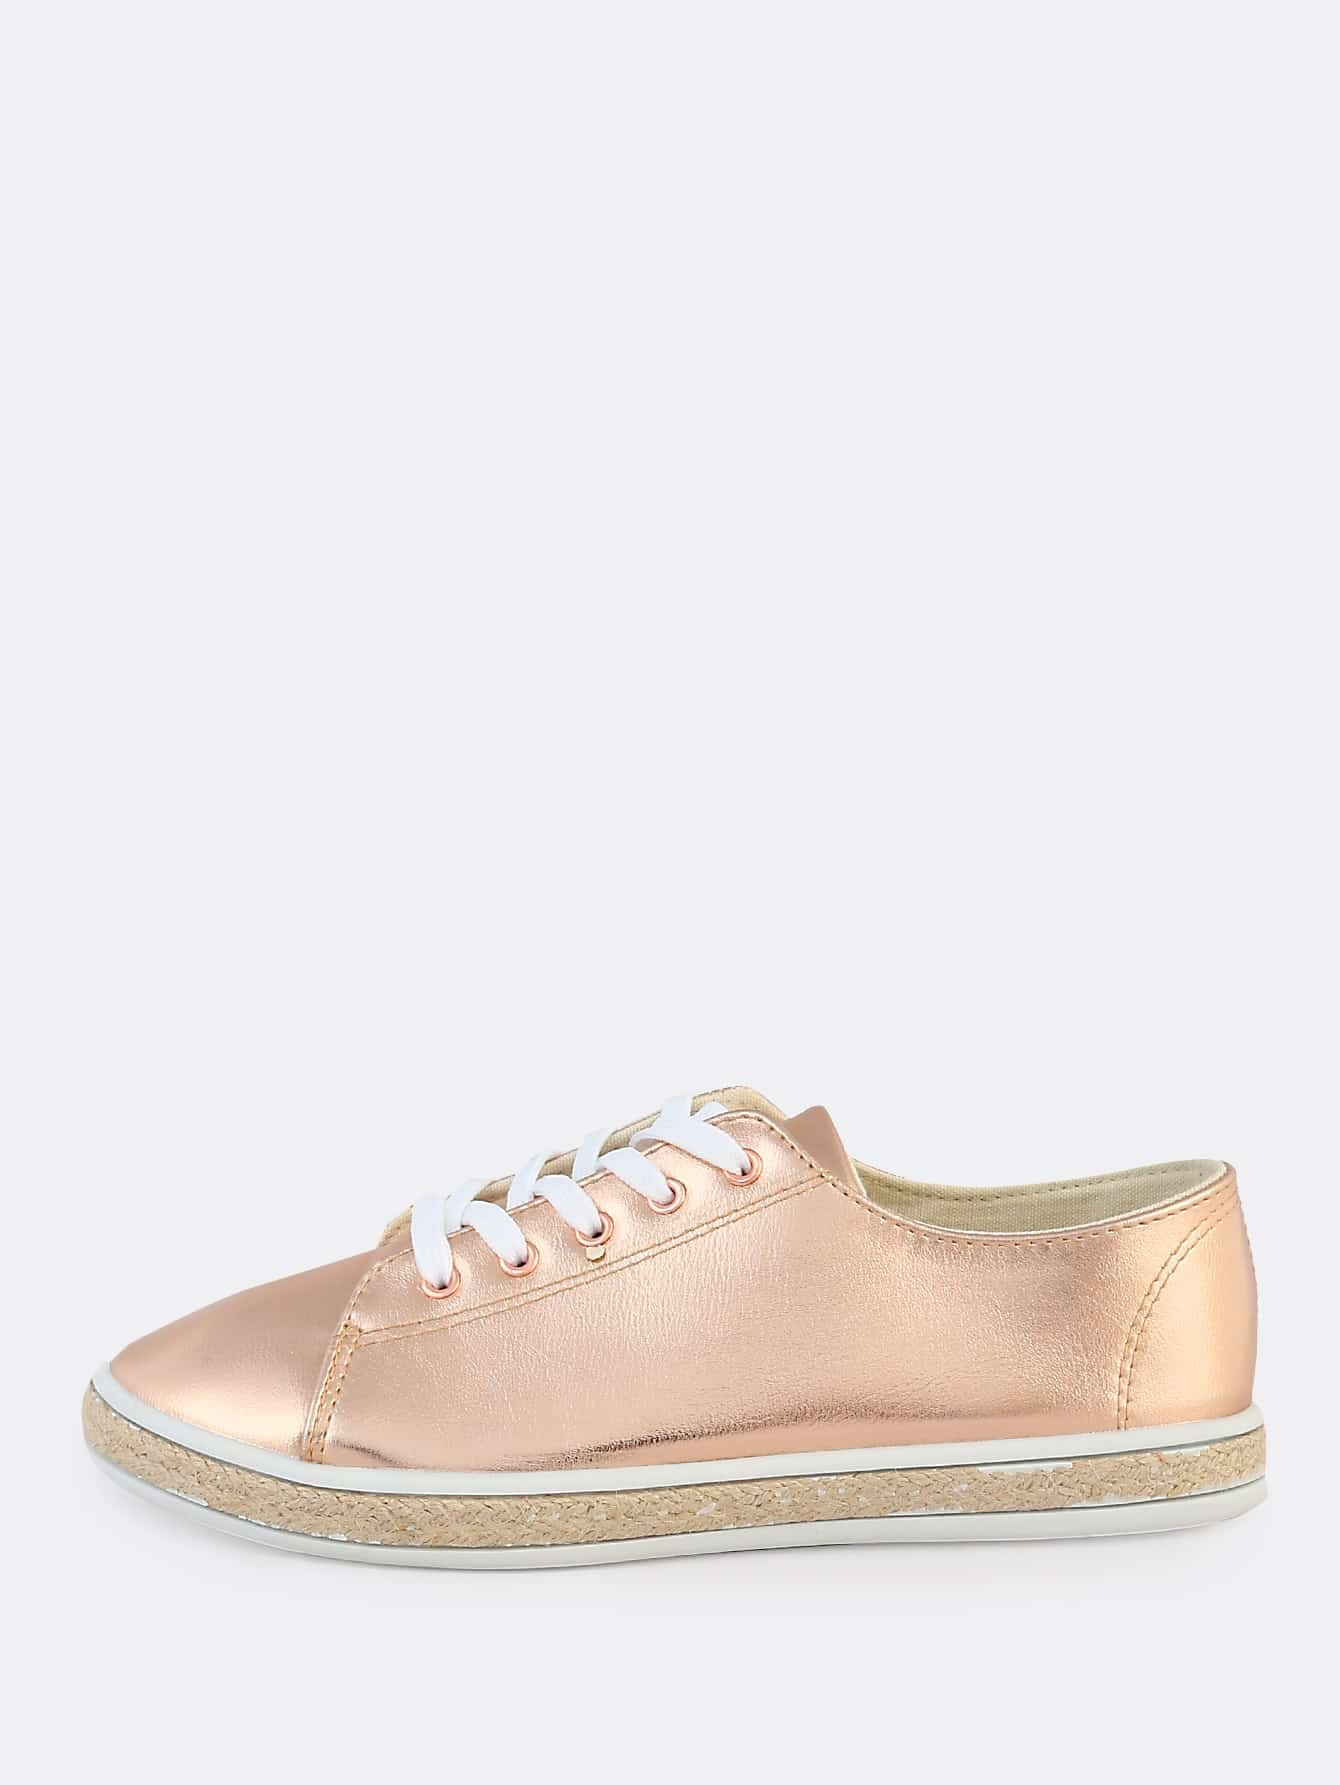 metallic espadrilles sneakers rose gold makemechic com. Black Bedroom Furniture Sets. Home Design Ideas